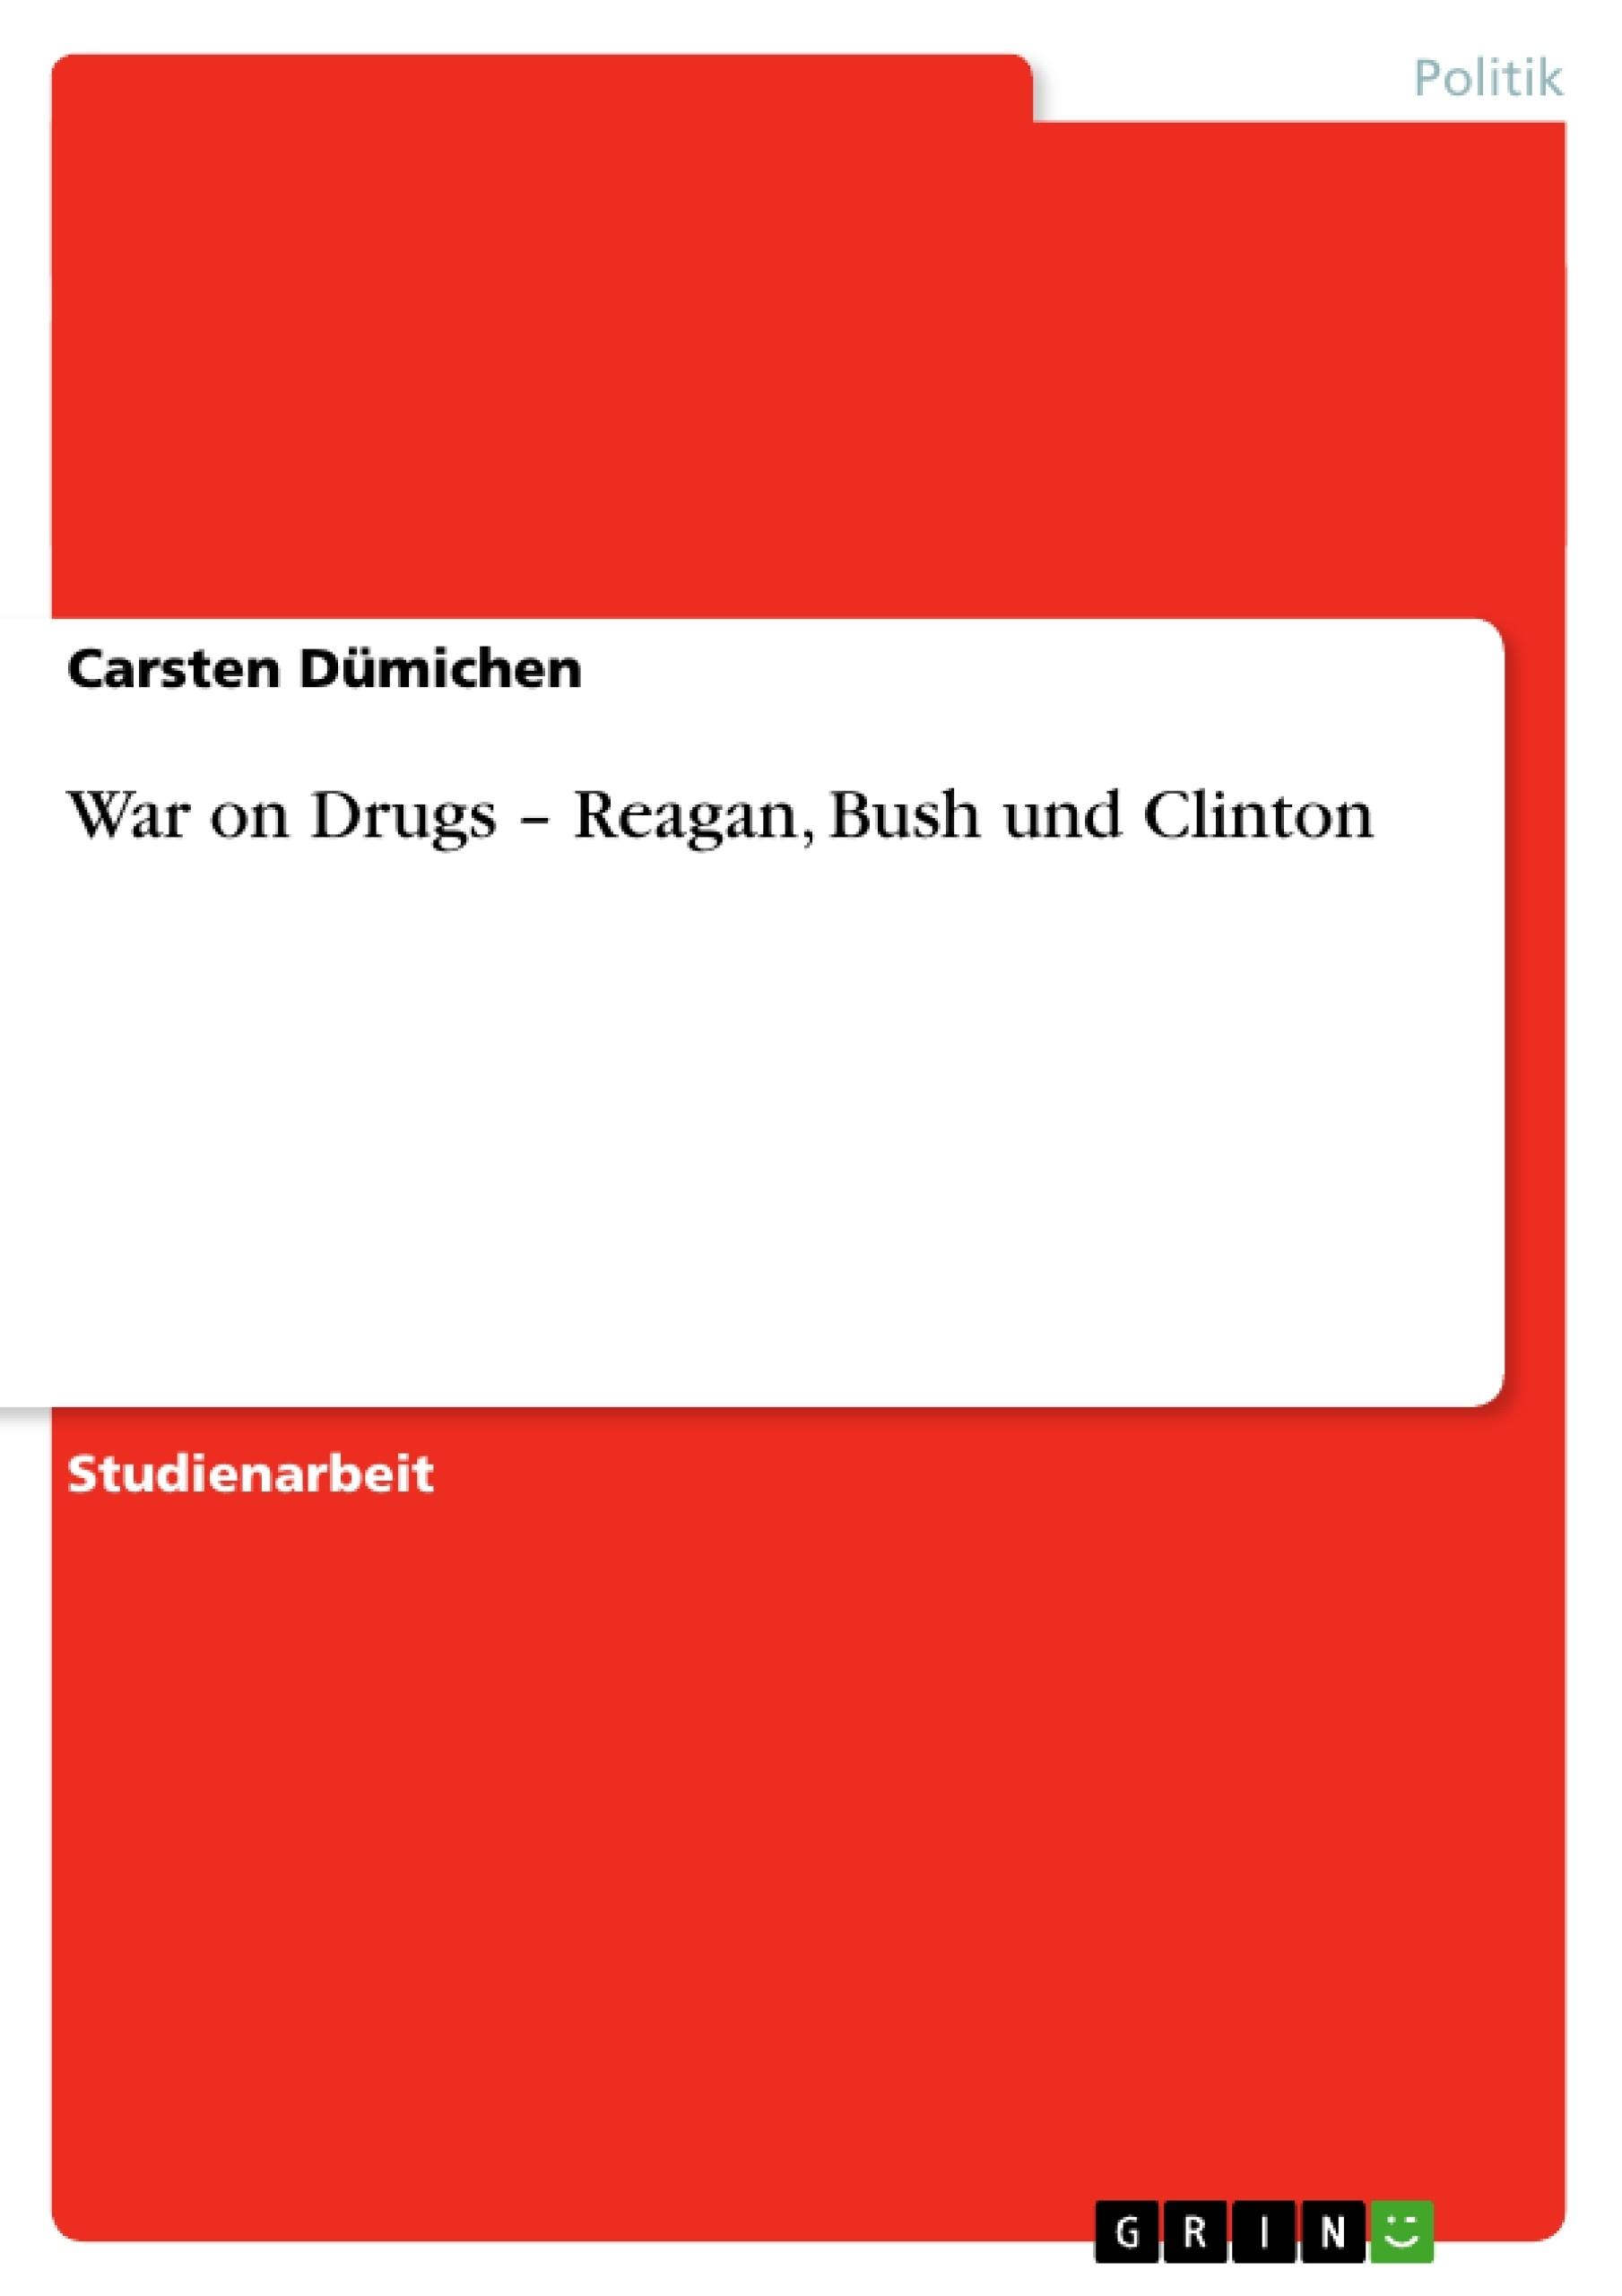 Titel: War on Drugs – Reagan, Bush und Clinton